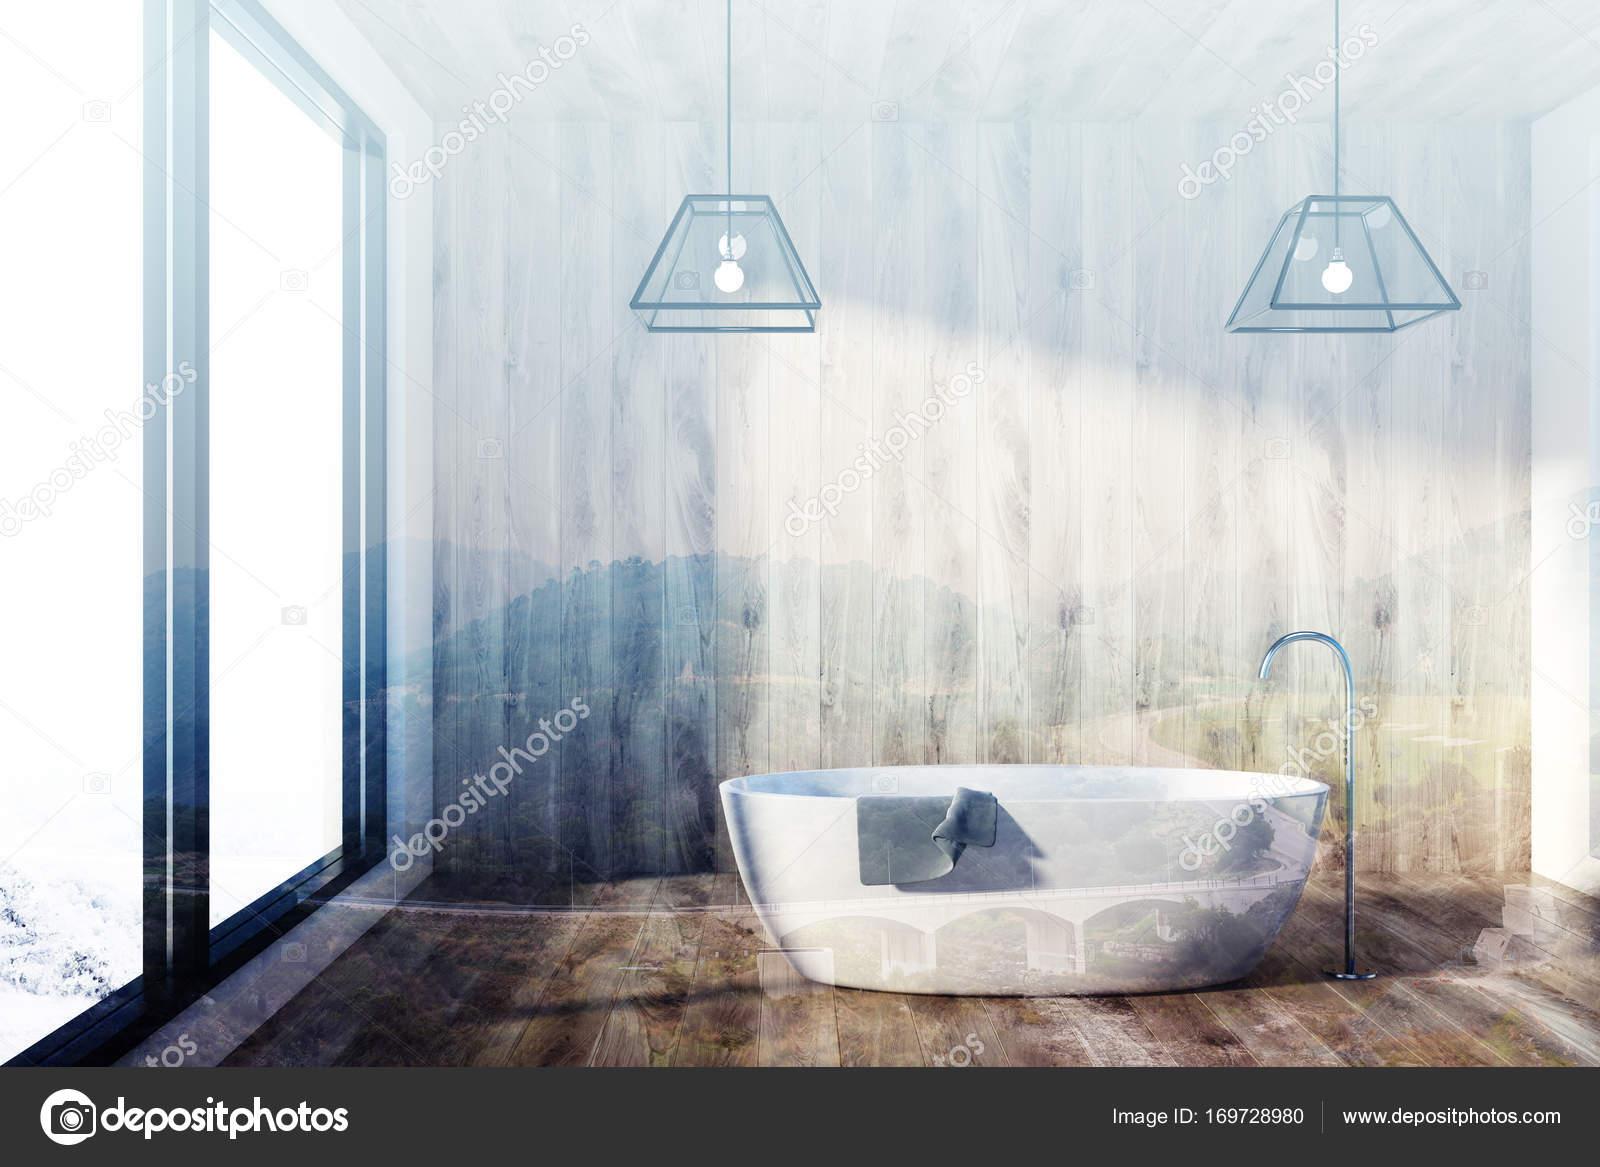 Vasca Da Bagno Doppia : Bagno in legno vasca e finestra doppia u2014 foto stock